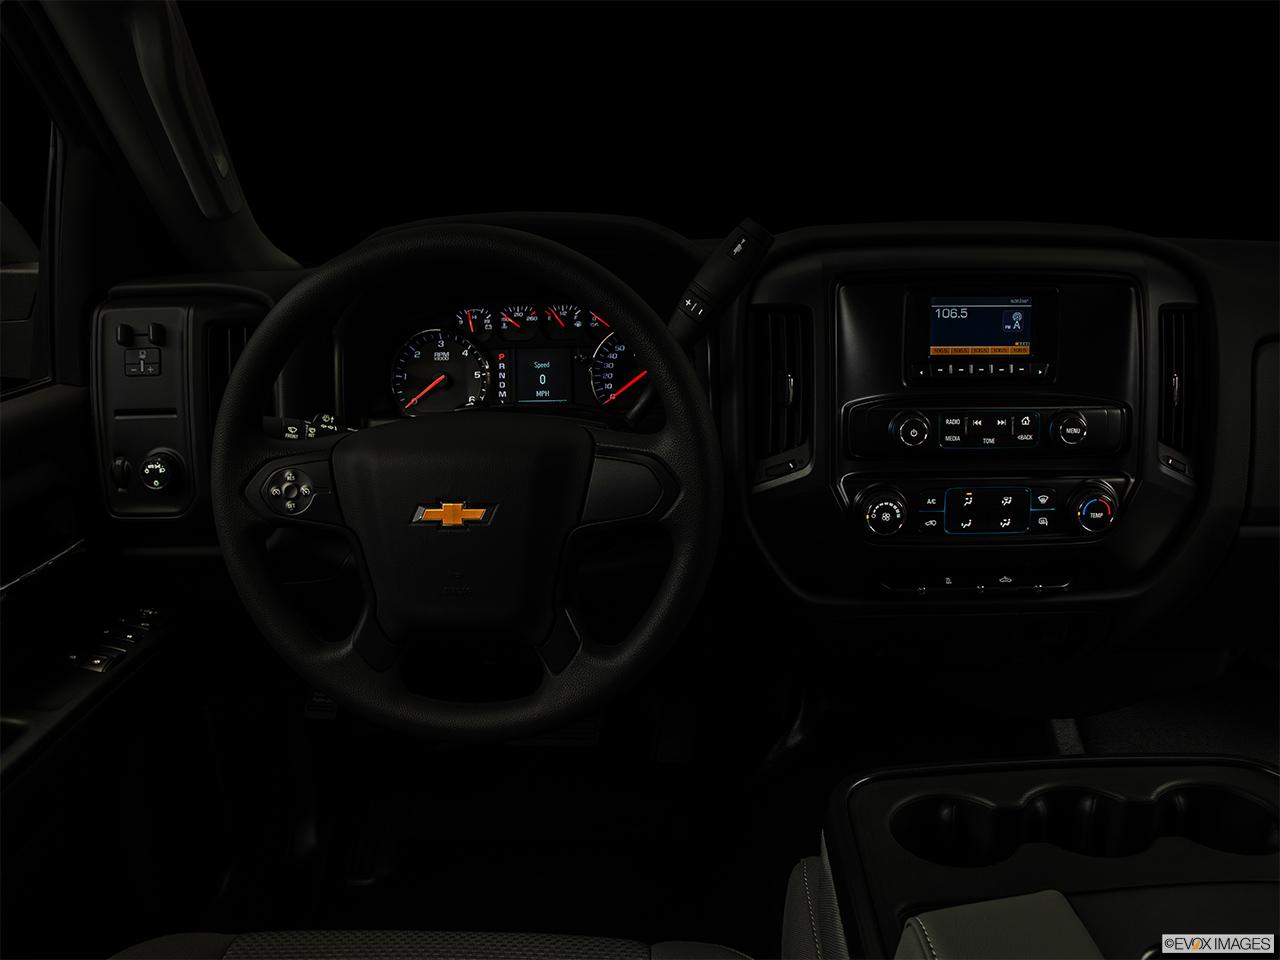 2015 chevrolet silverado 2500hd 2wd reg cab 1336 work truck 2015 chevrolet silverado 2500hd 2wd reg cab 1336 work truck centered wide dash shot publicscrutiny Choice Image